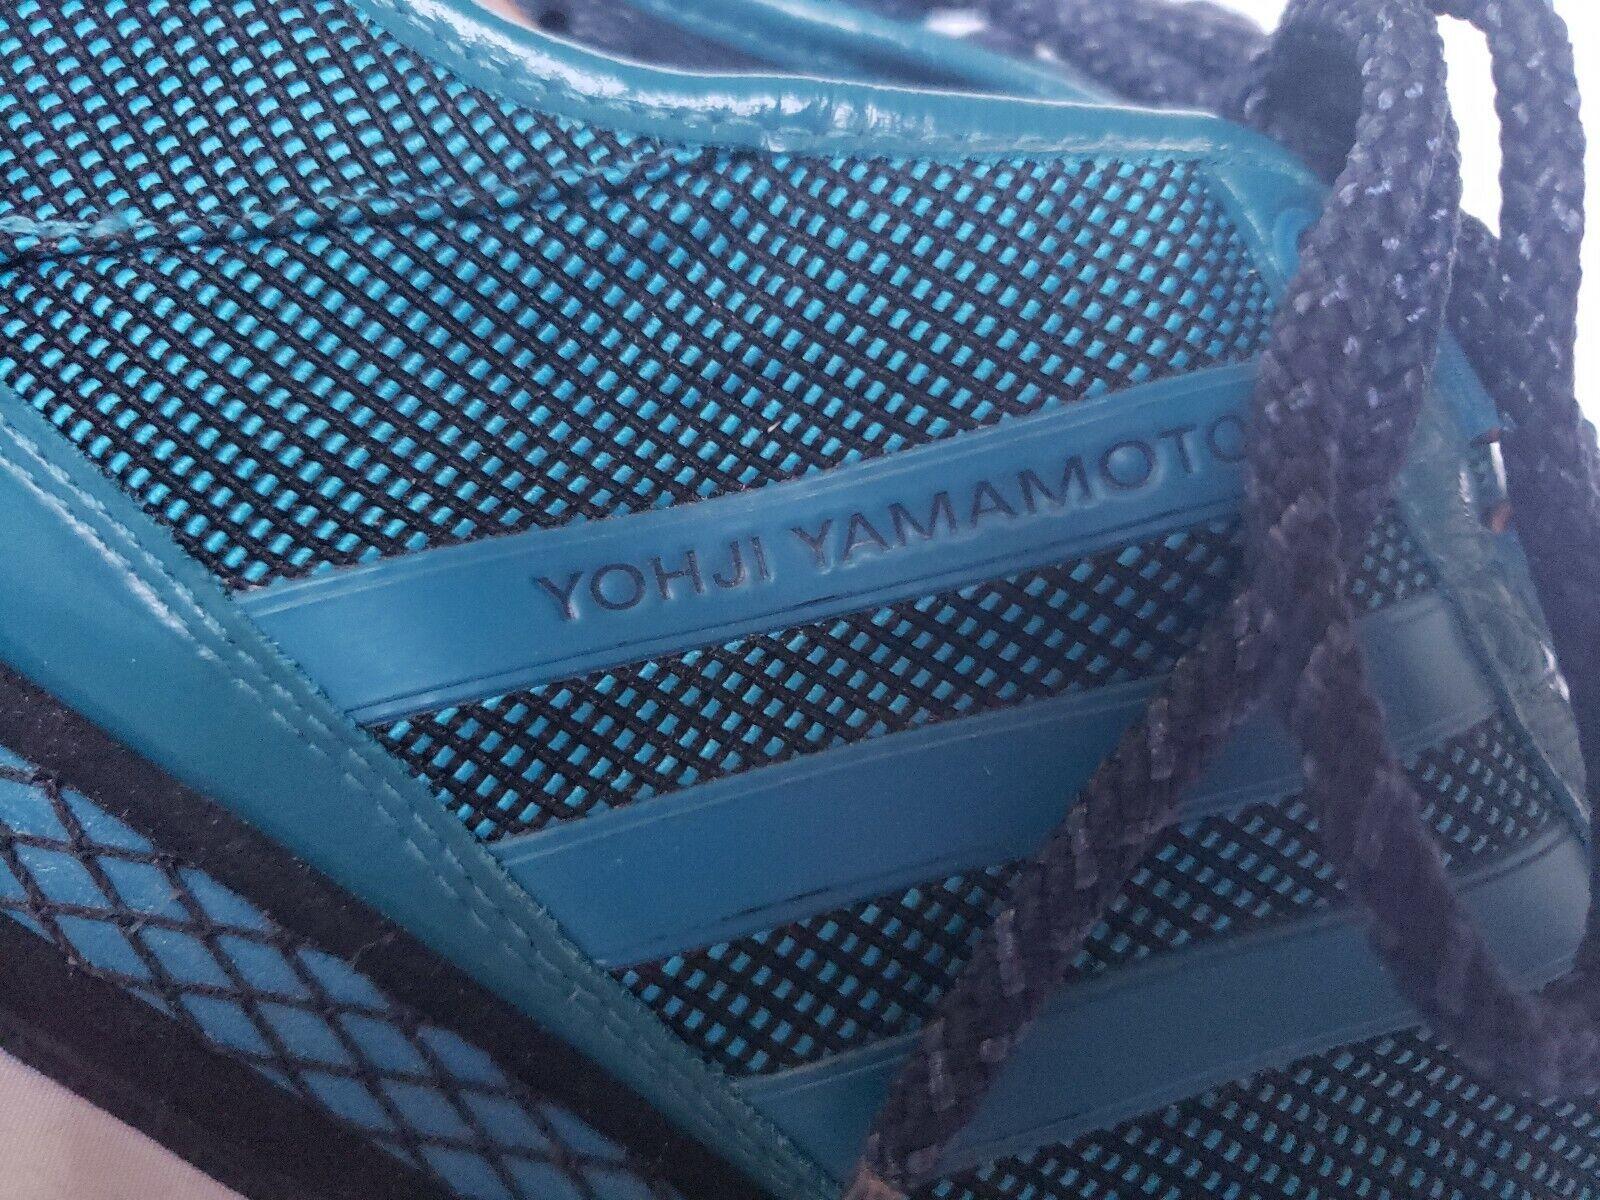 Yohji Yamamoto Y3 Adidas Sneaker Blue Athletic Shoe 2008 Men Size 8 42.5 663001